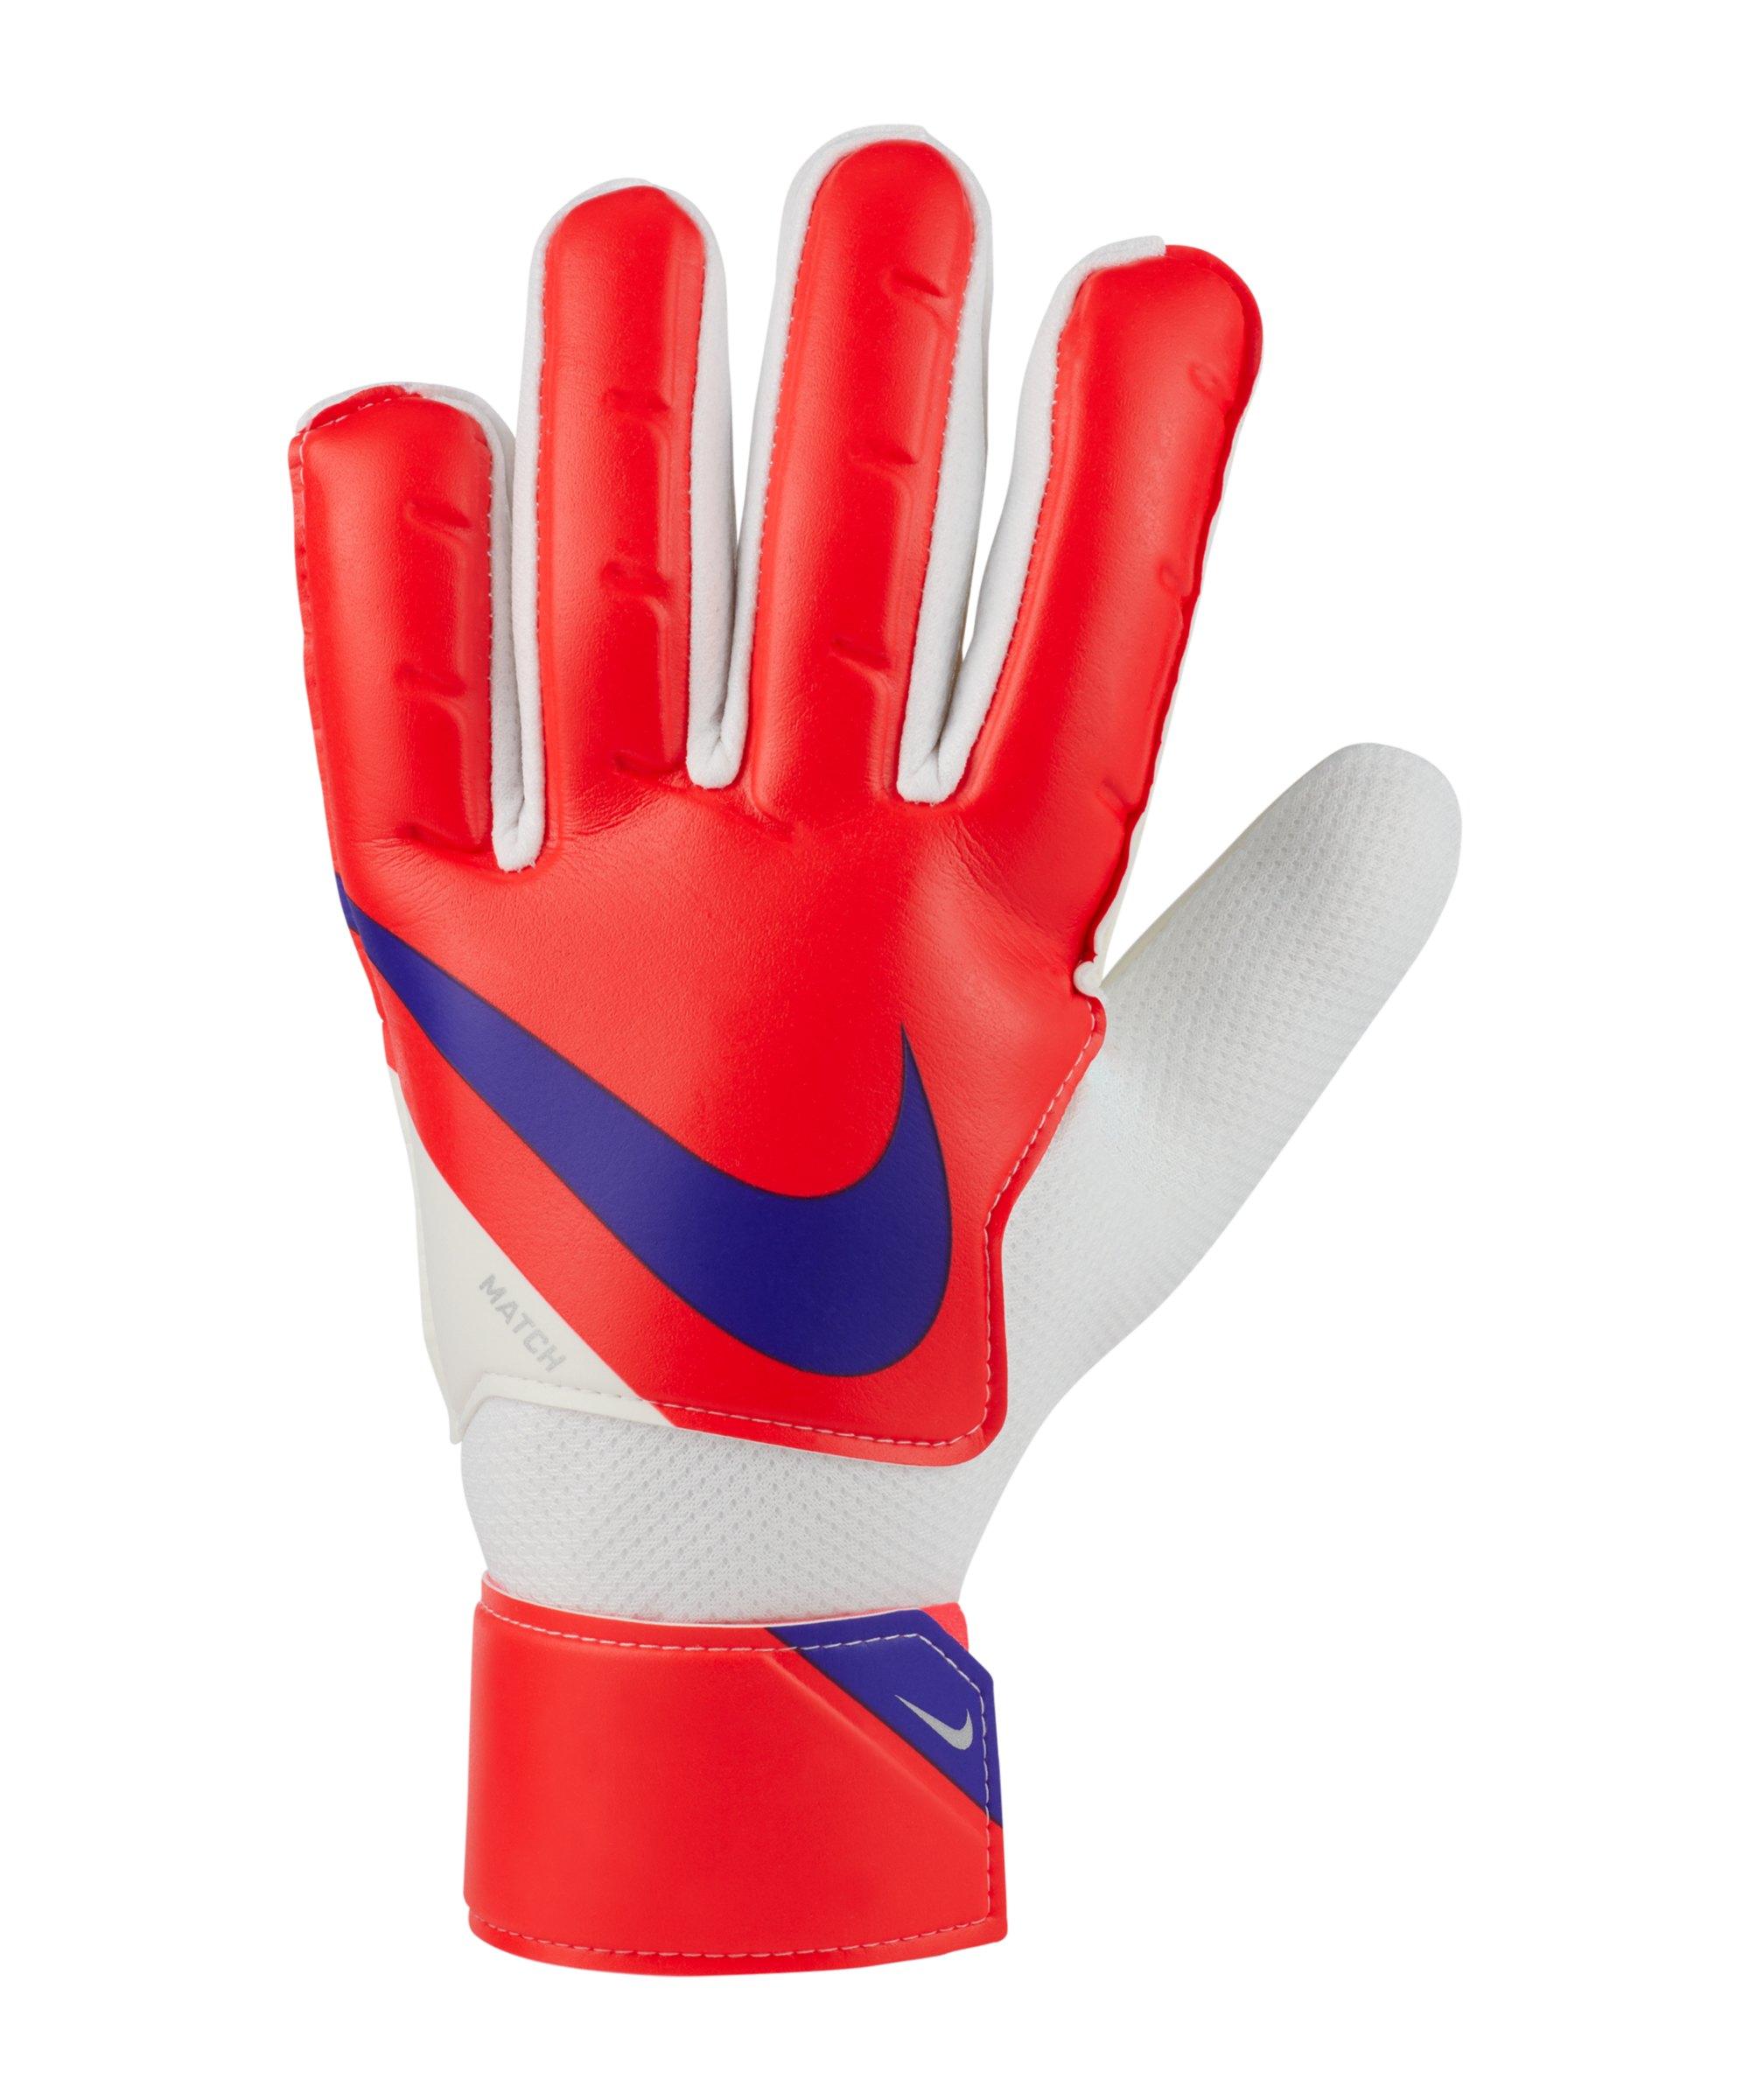 Nike Match Torwarthandschuh Rot Lila F635 - rot